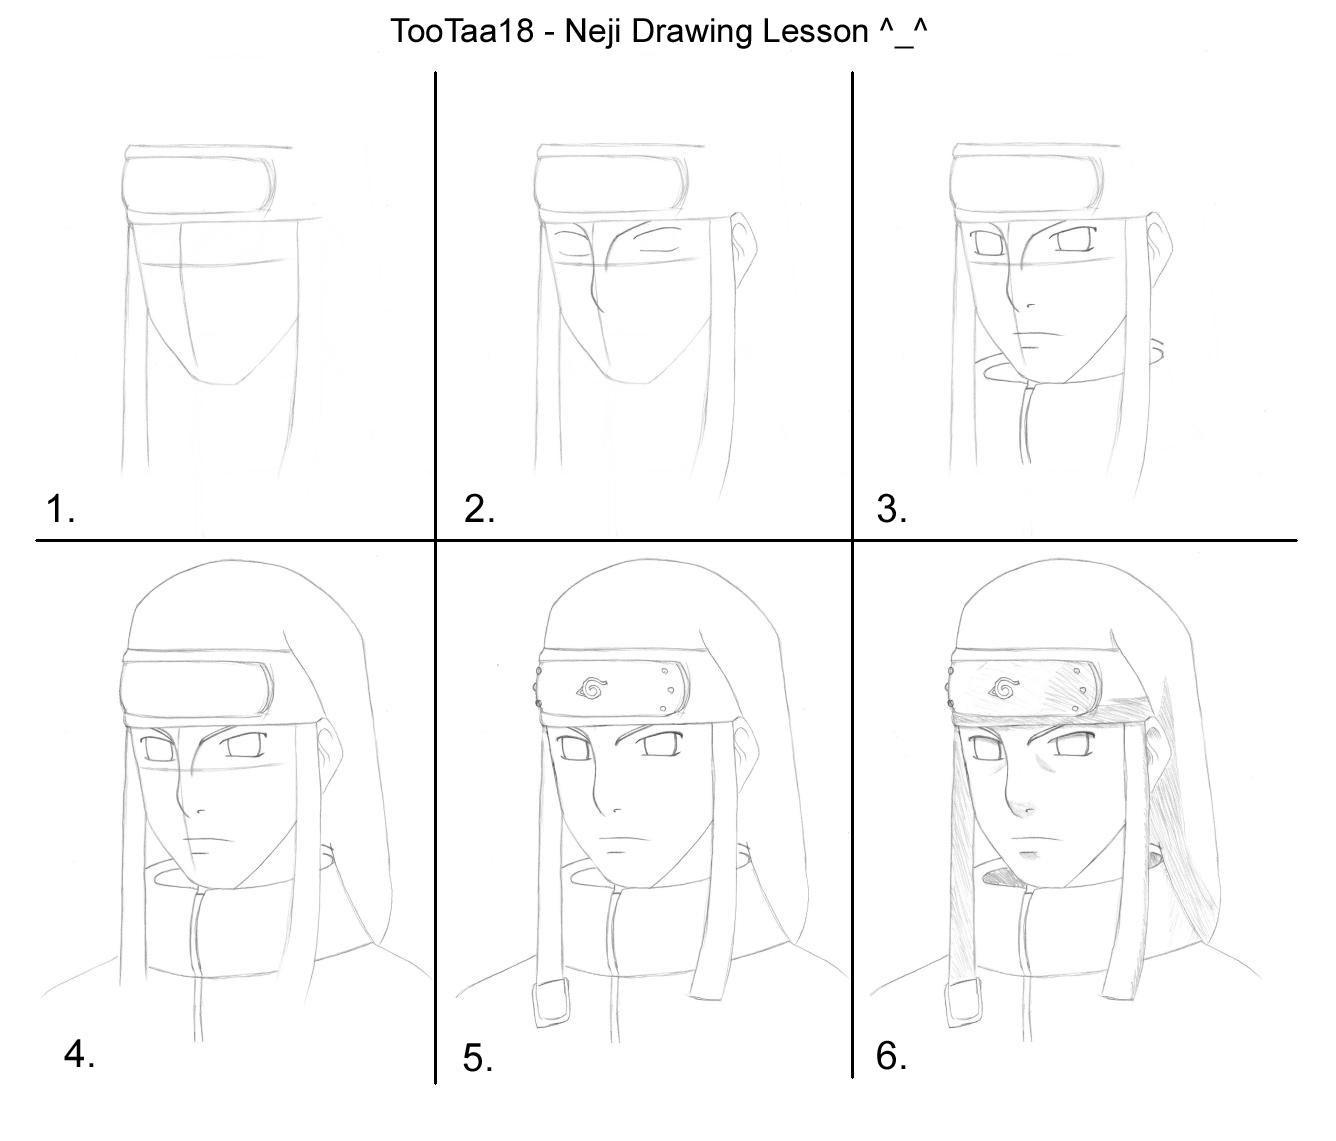 Neji Drawing Tutorial By Tootaa18 On DeviantArt